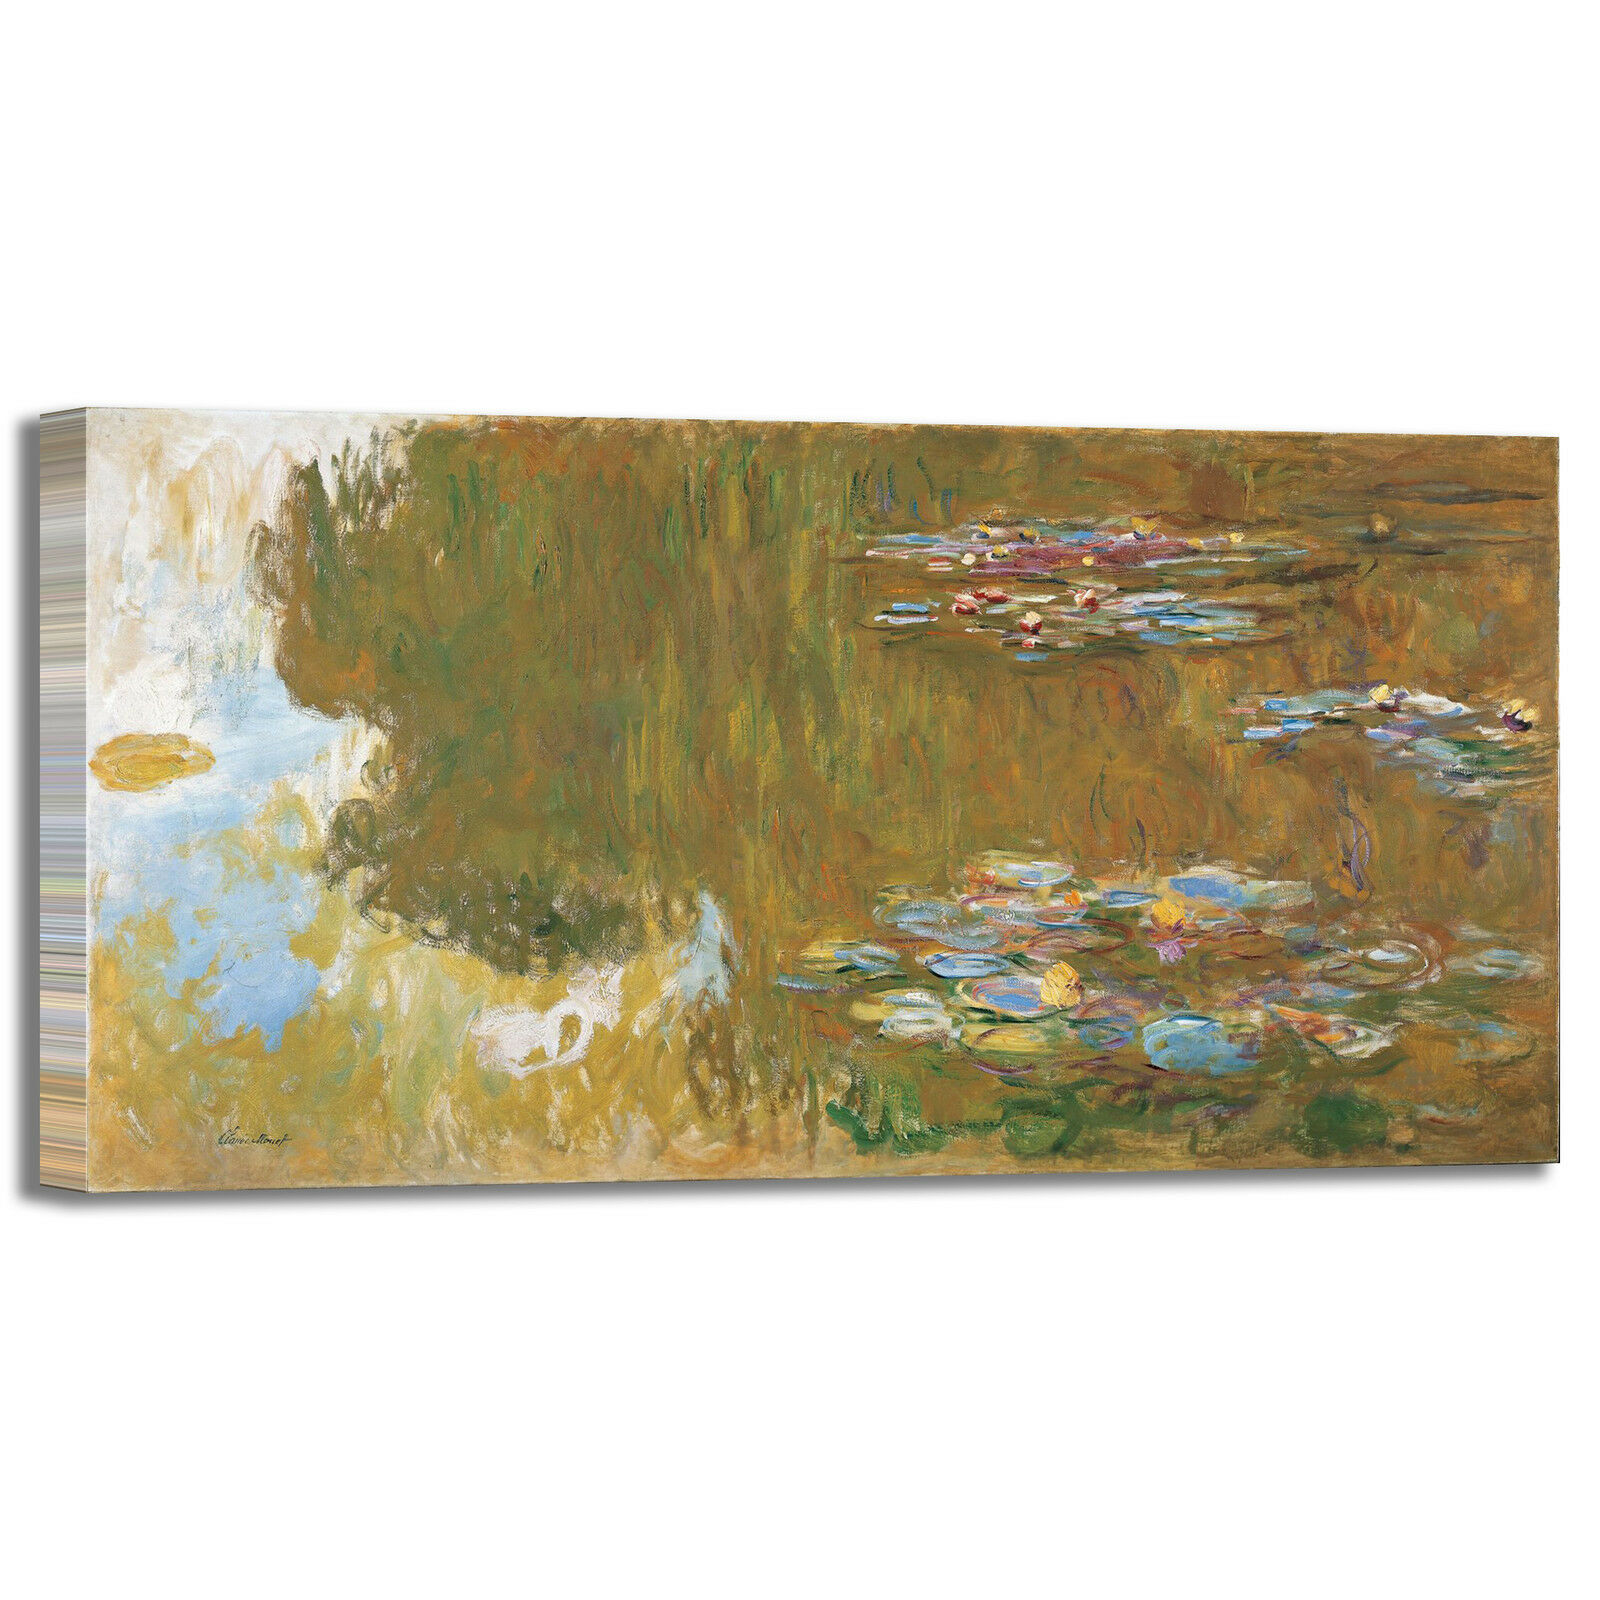 Monet ninfee 83 design quadro stampa tela dipinto telaio arroto casa